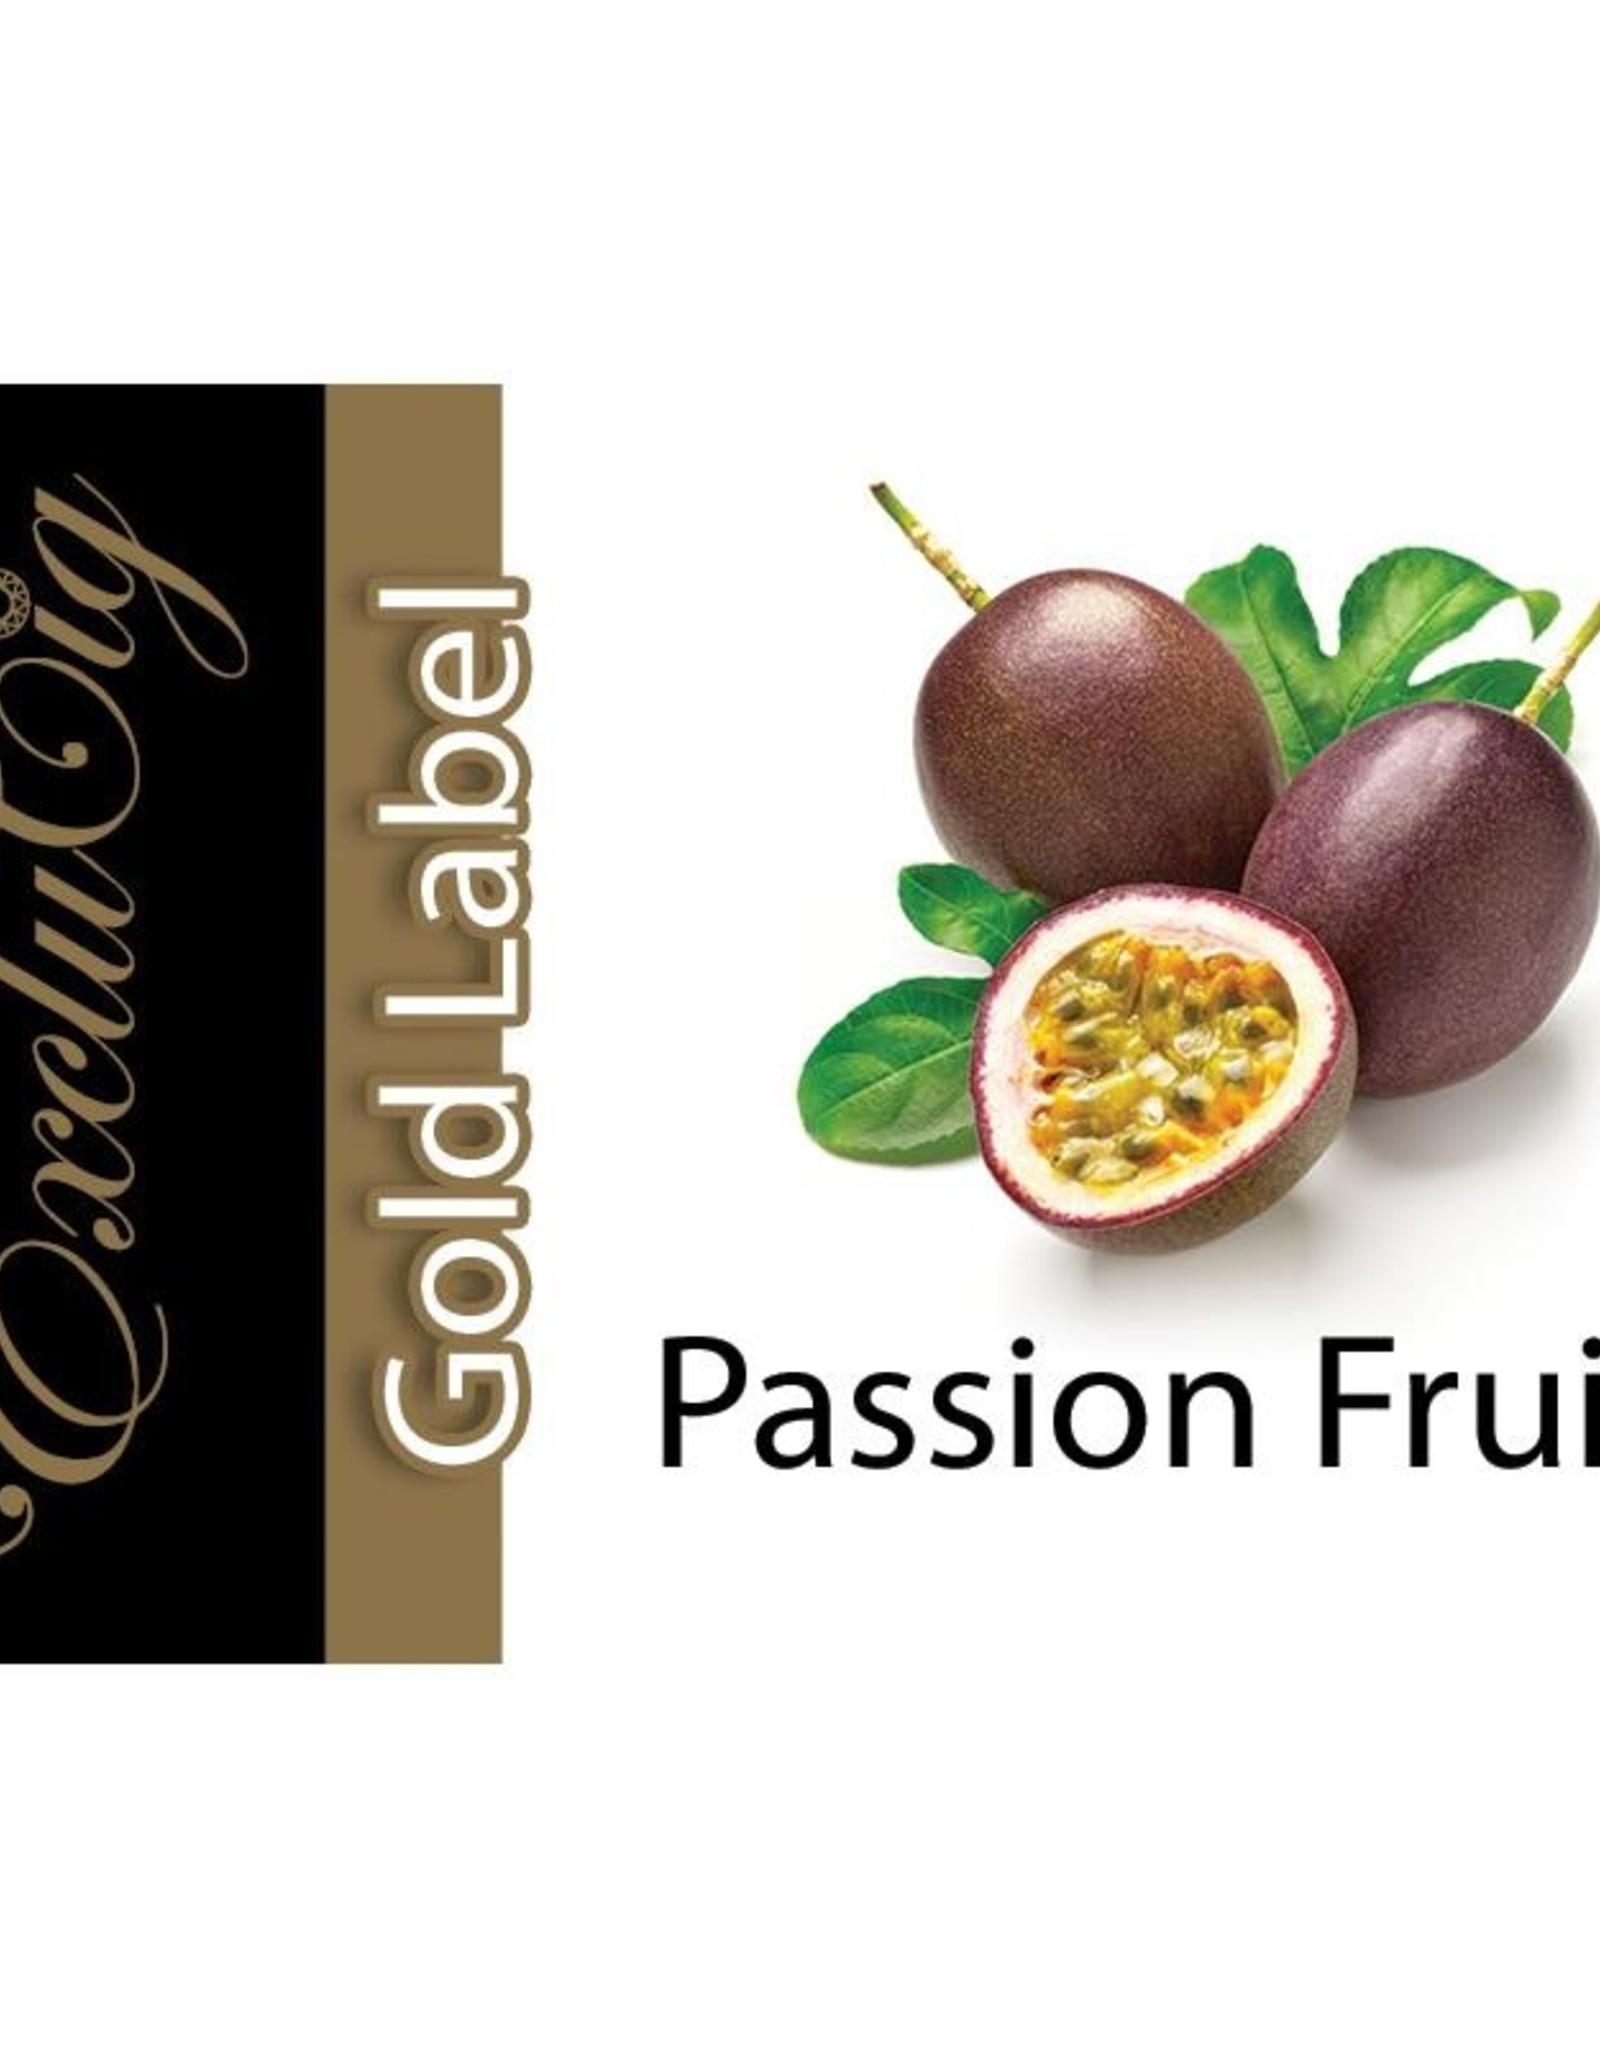 Exclucig Exclucig Gold Label E-liquid Passion Fruit 3 mg Nicotine